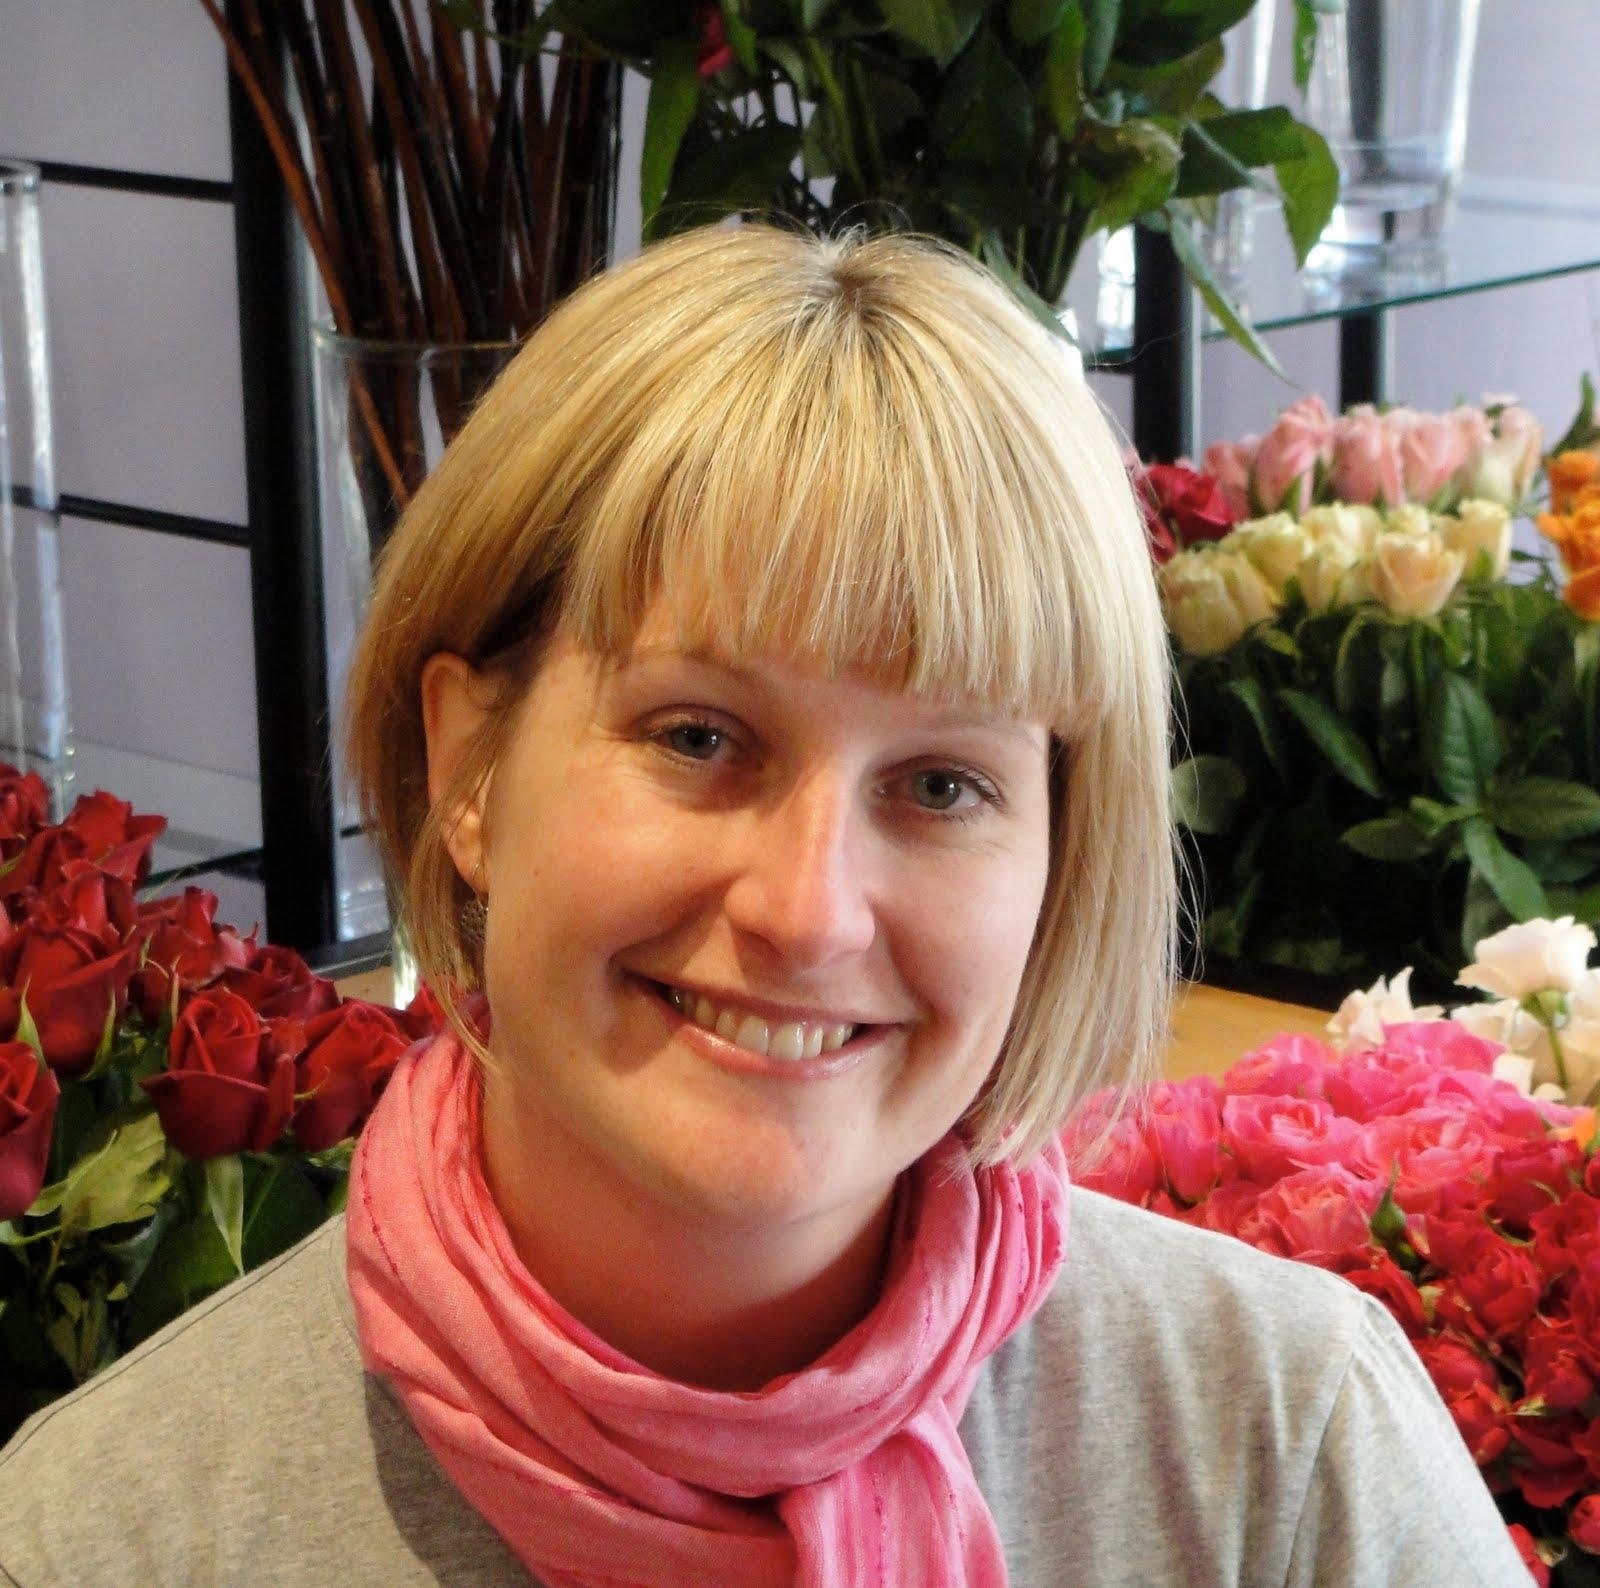 Real Weddings Tasmania: Bride Tasmania Blog: Choosing The Right Wedding Florist